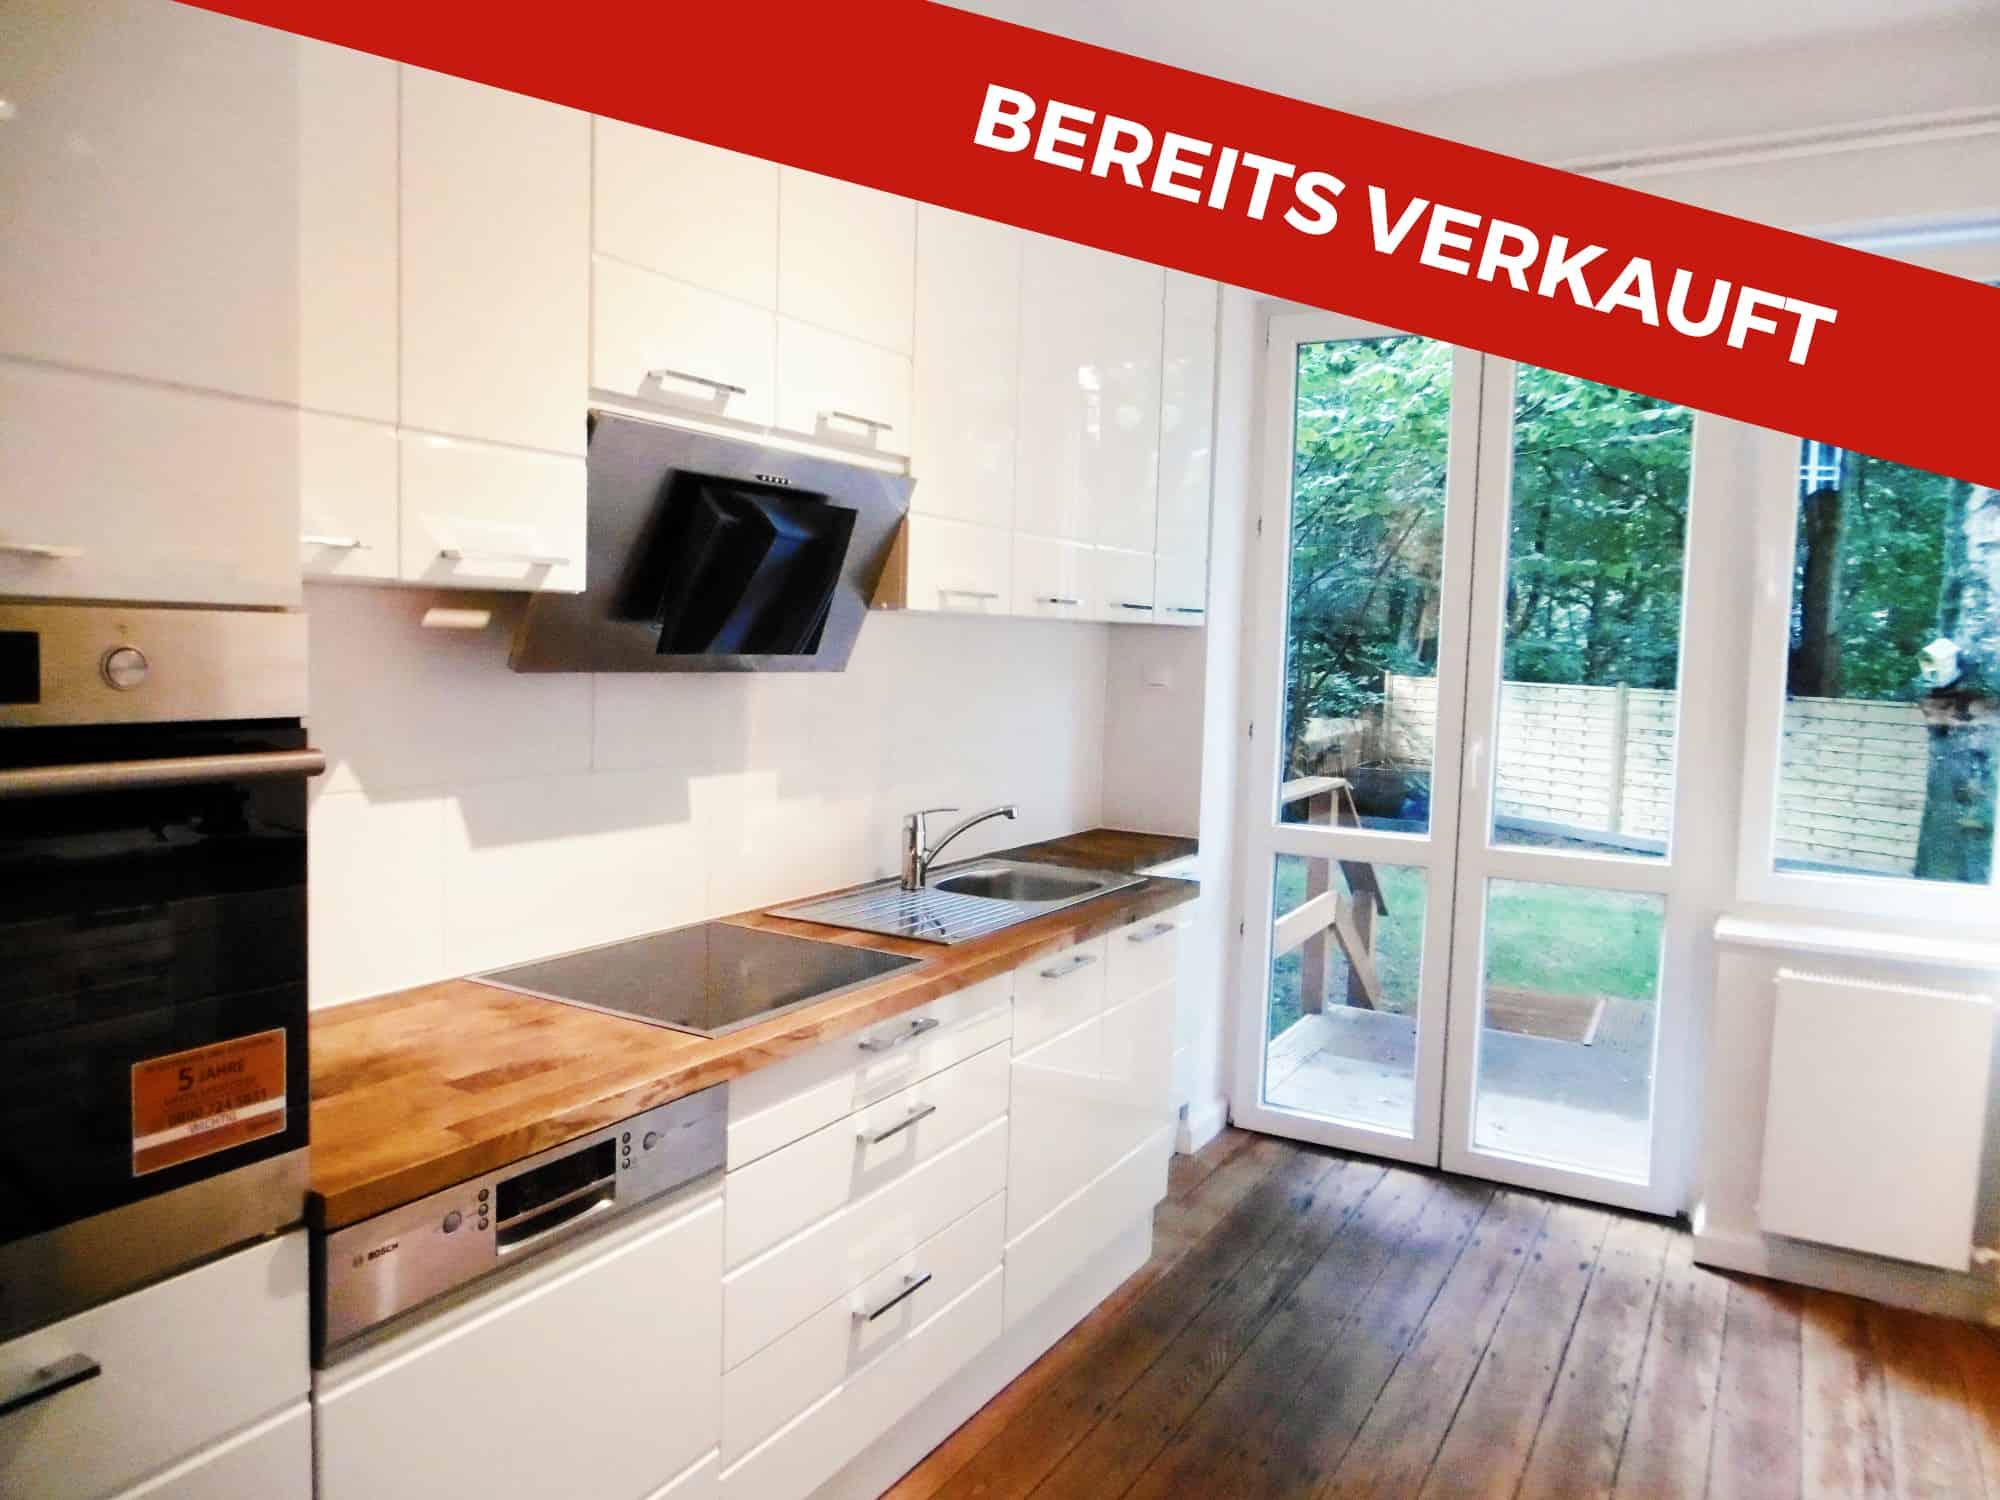 Küche Eigentumswohung Eimsbüttel Paul & Paul Immobilien